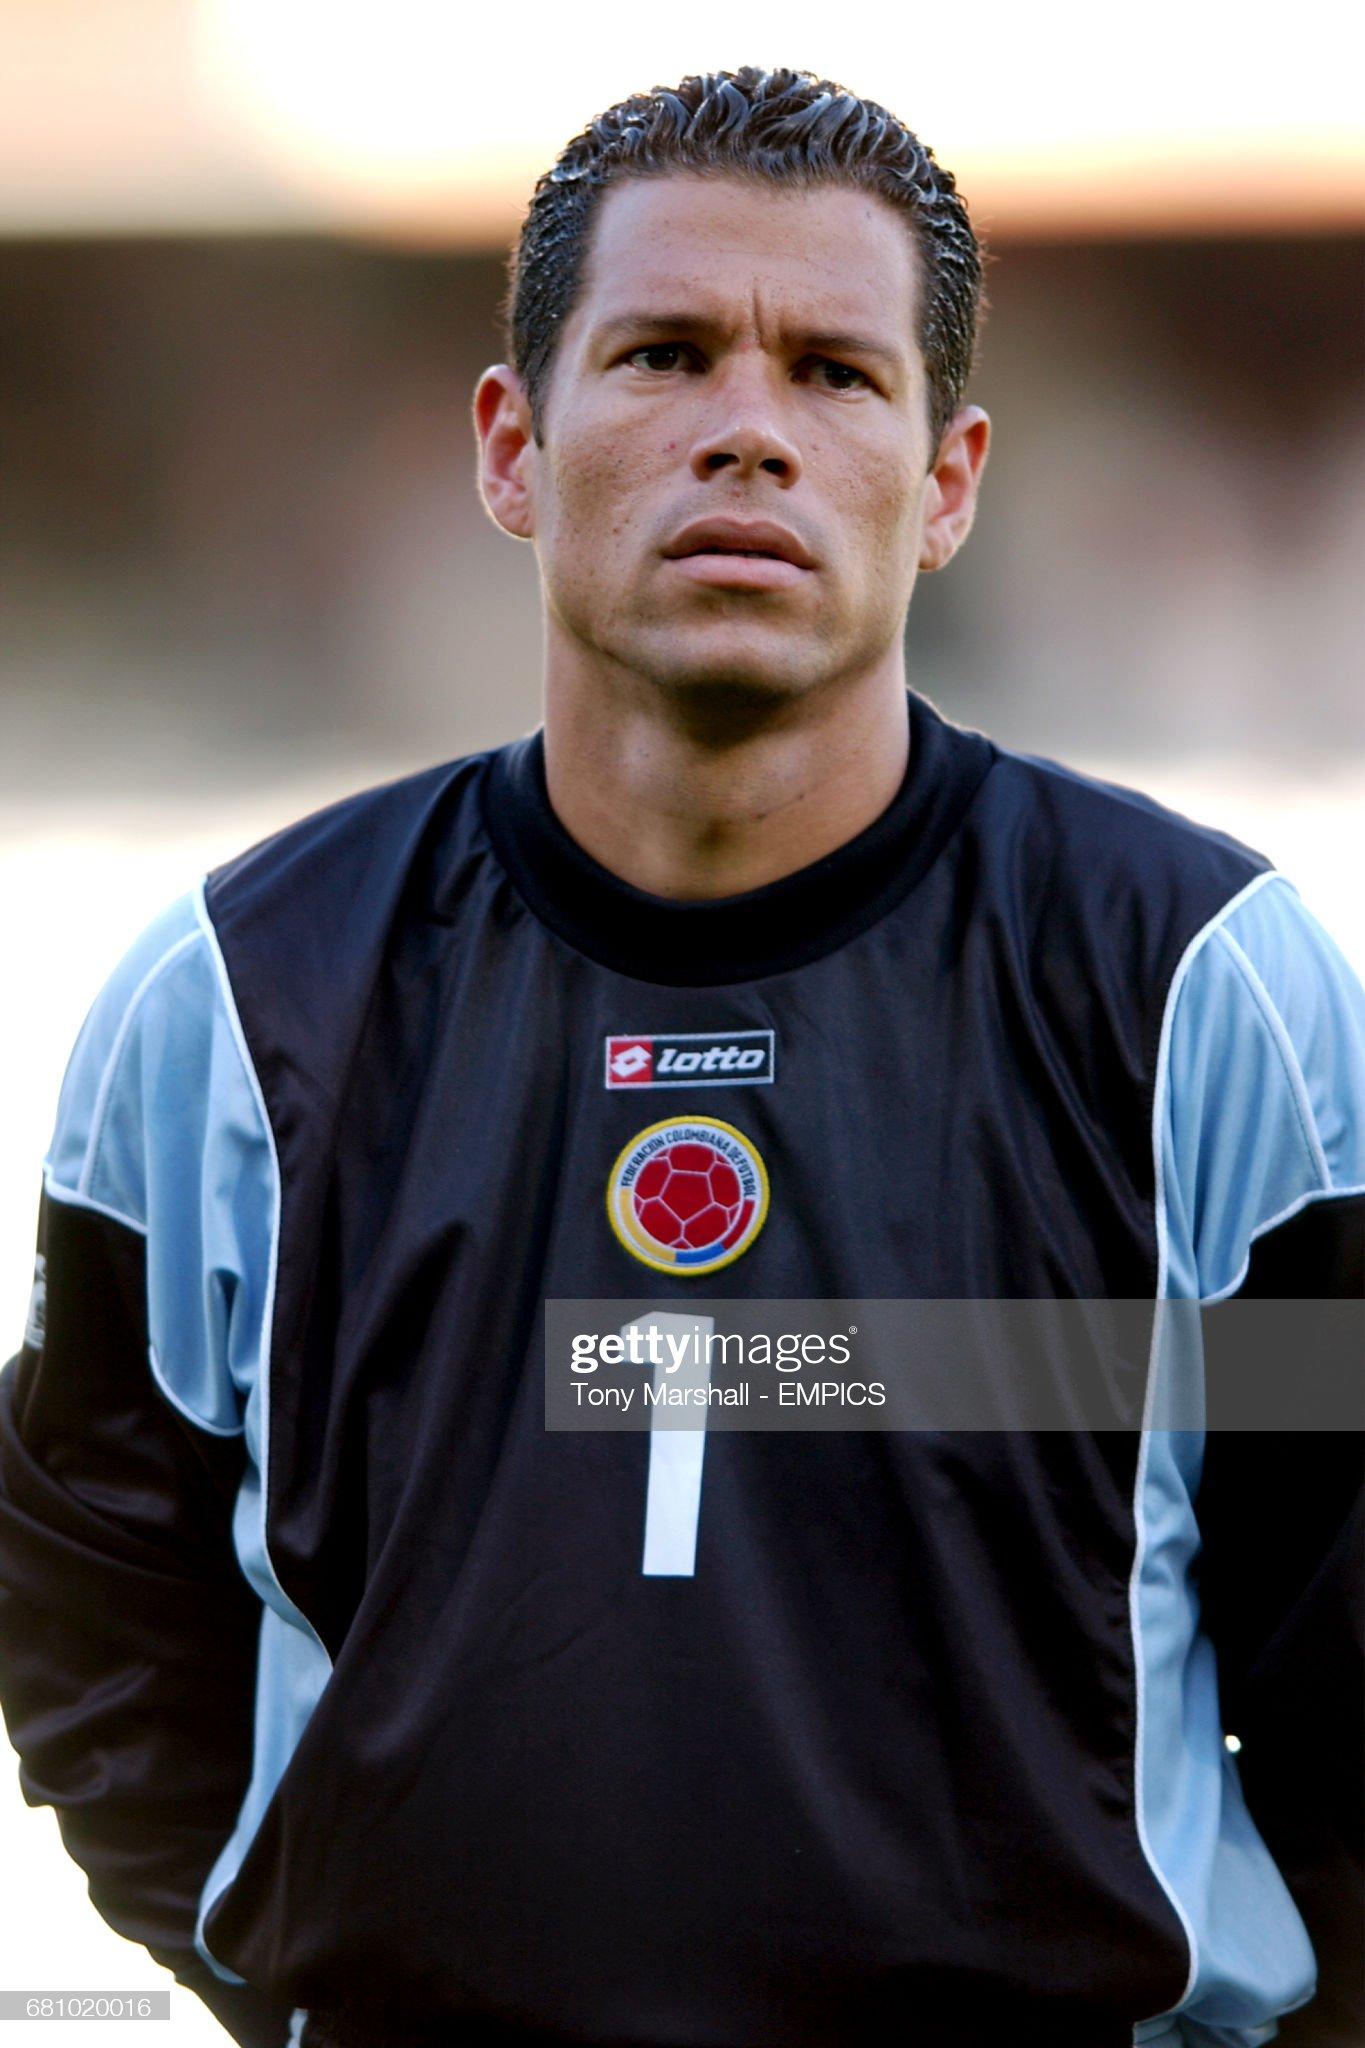 [Imagen: colombias-goalkeeper-oscar-cordoba-pictu...=2048x2048]